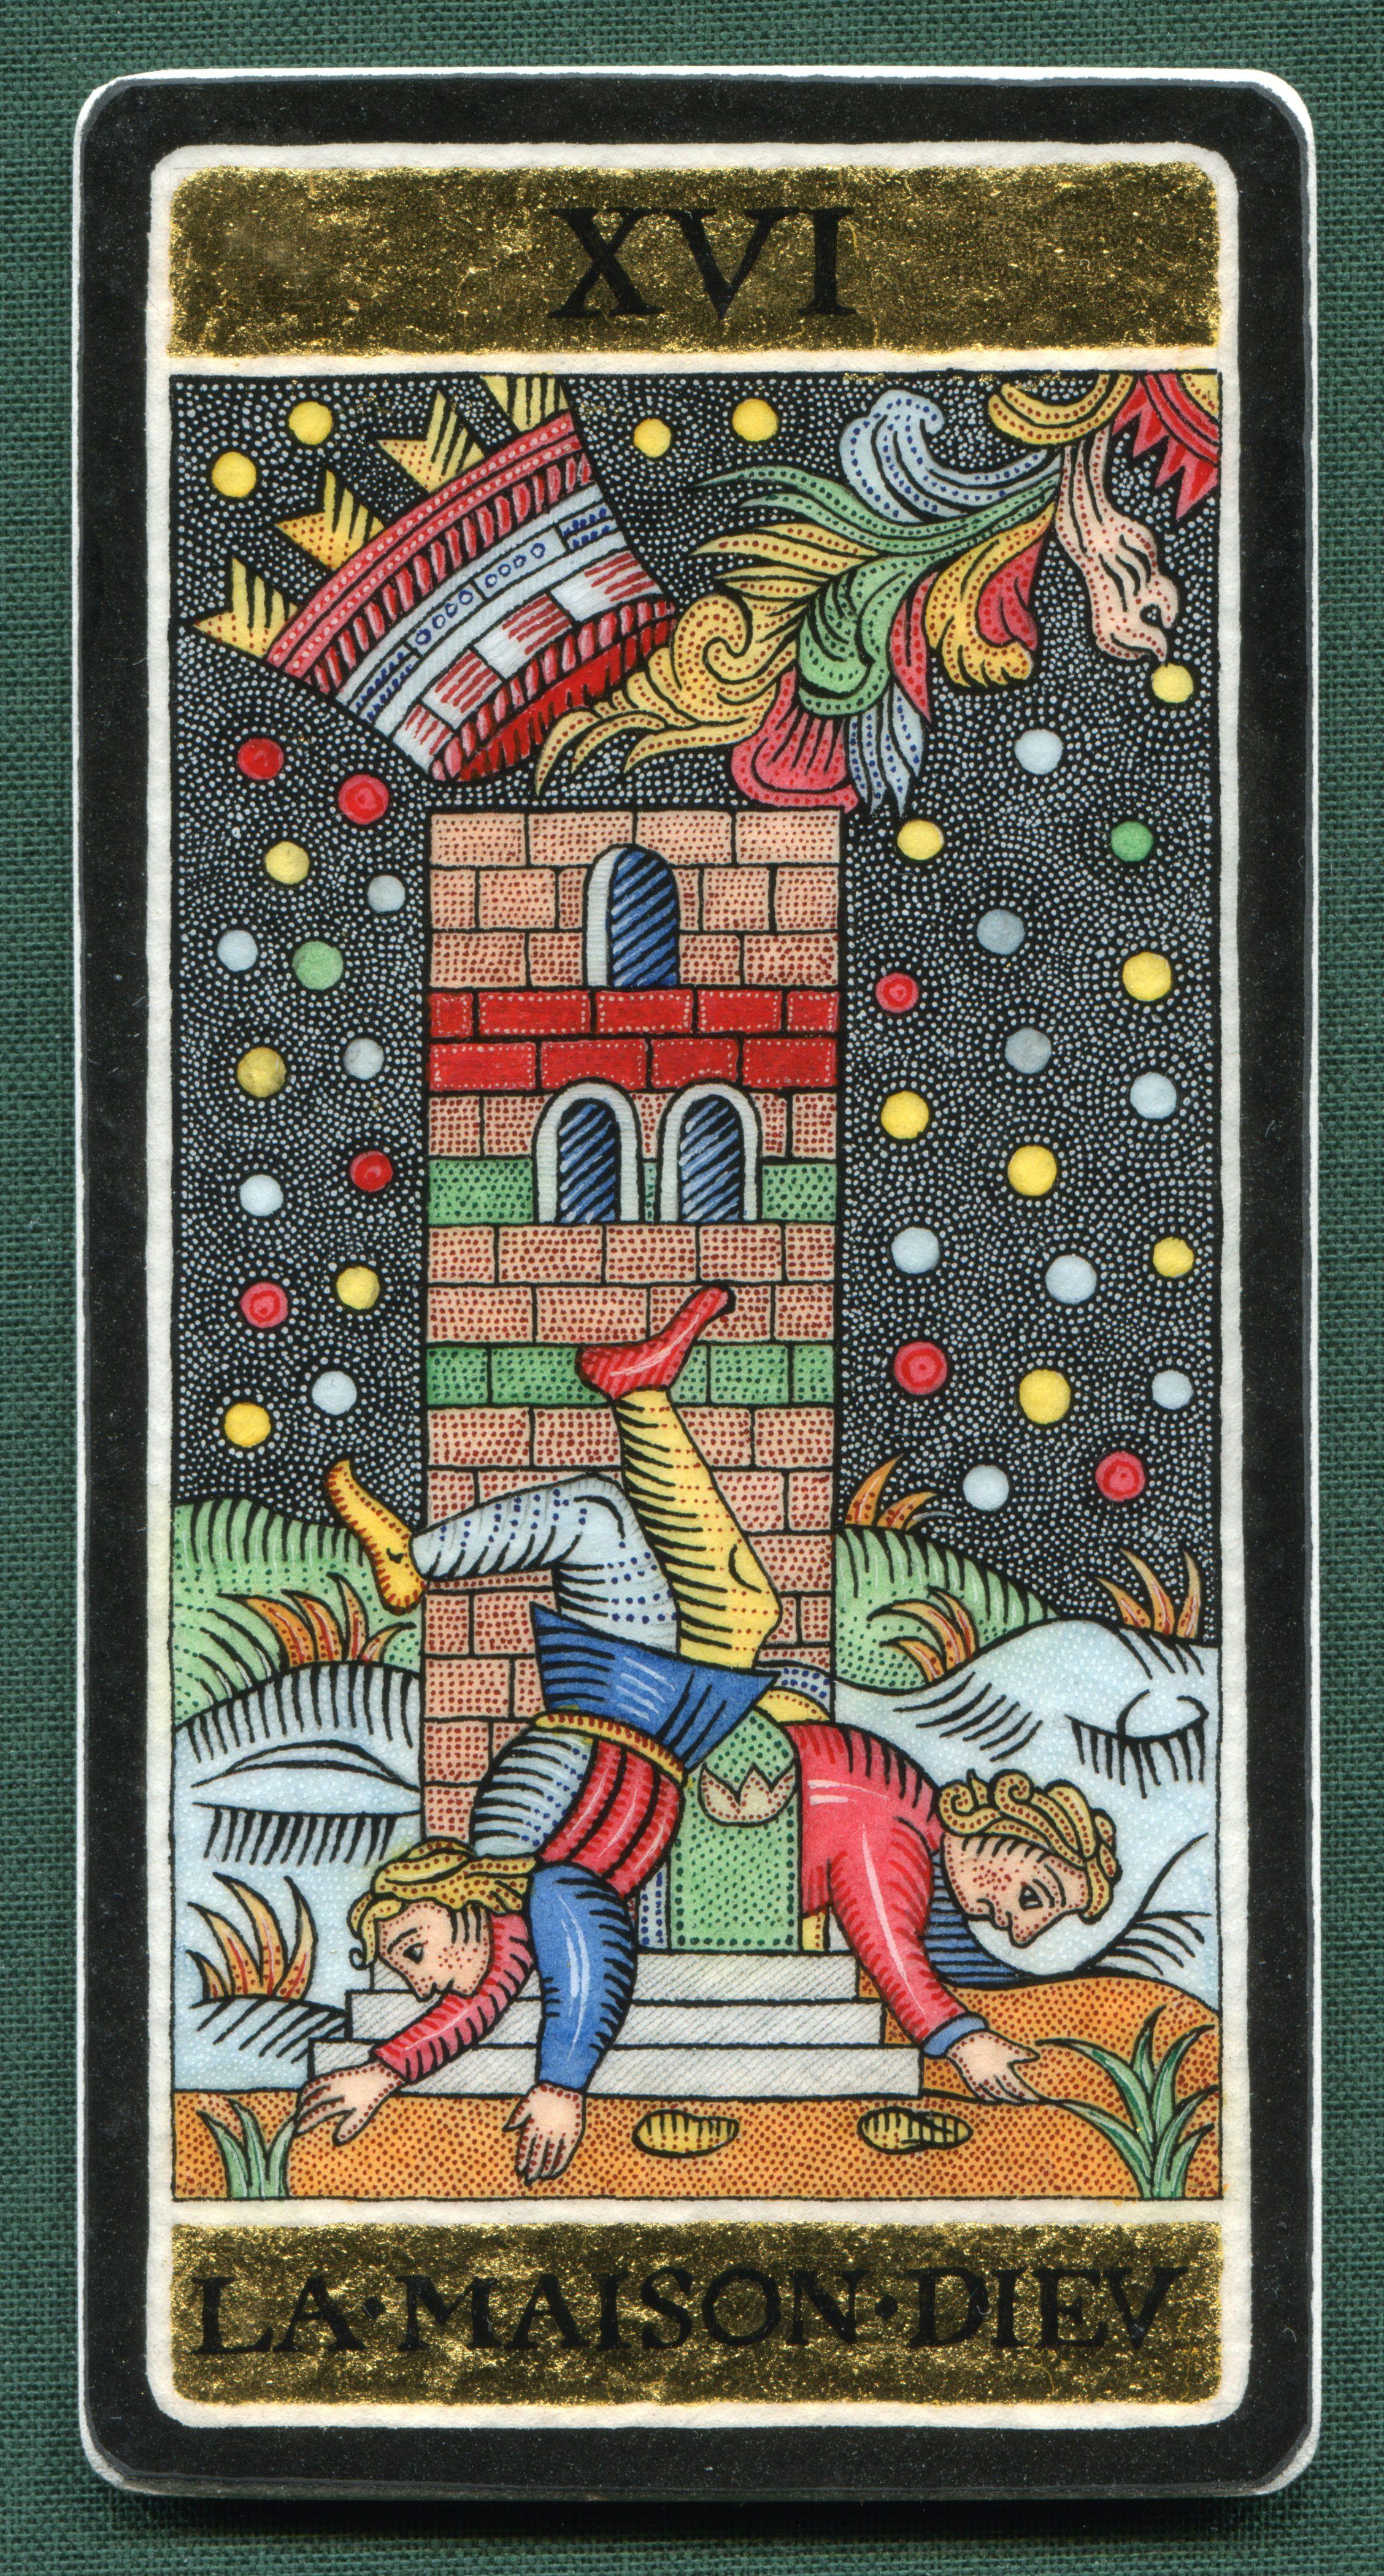 Marseille Tarot Cards 2010